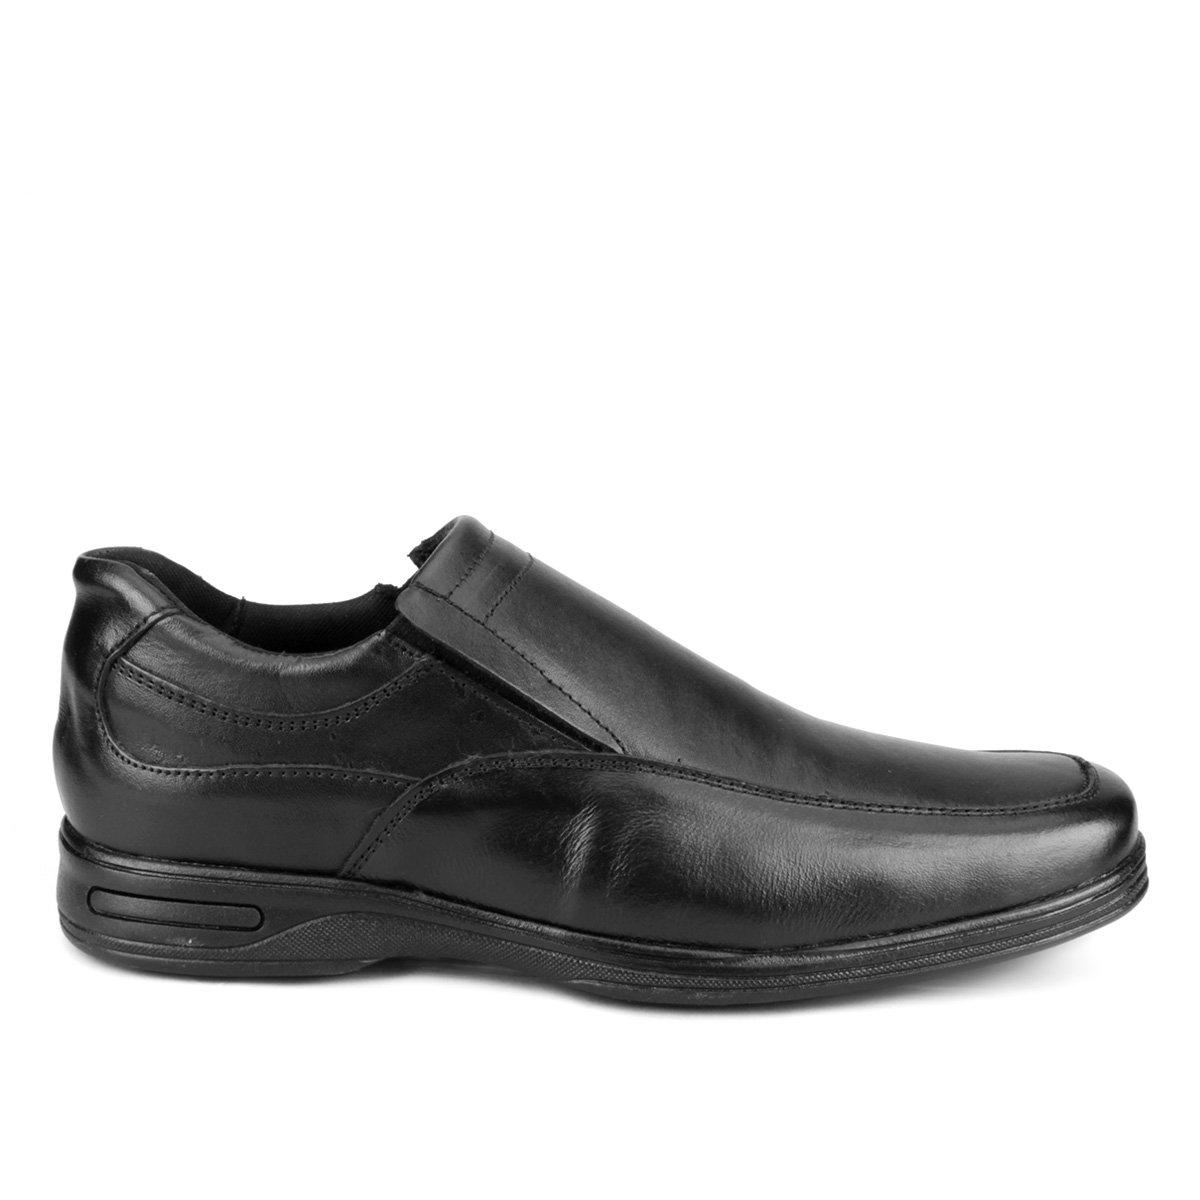 Sapato Preto Social Walkabout Social Couro Sapato Masculino de de qH54RzR